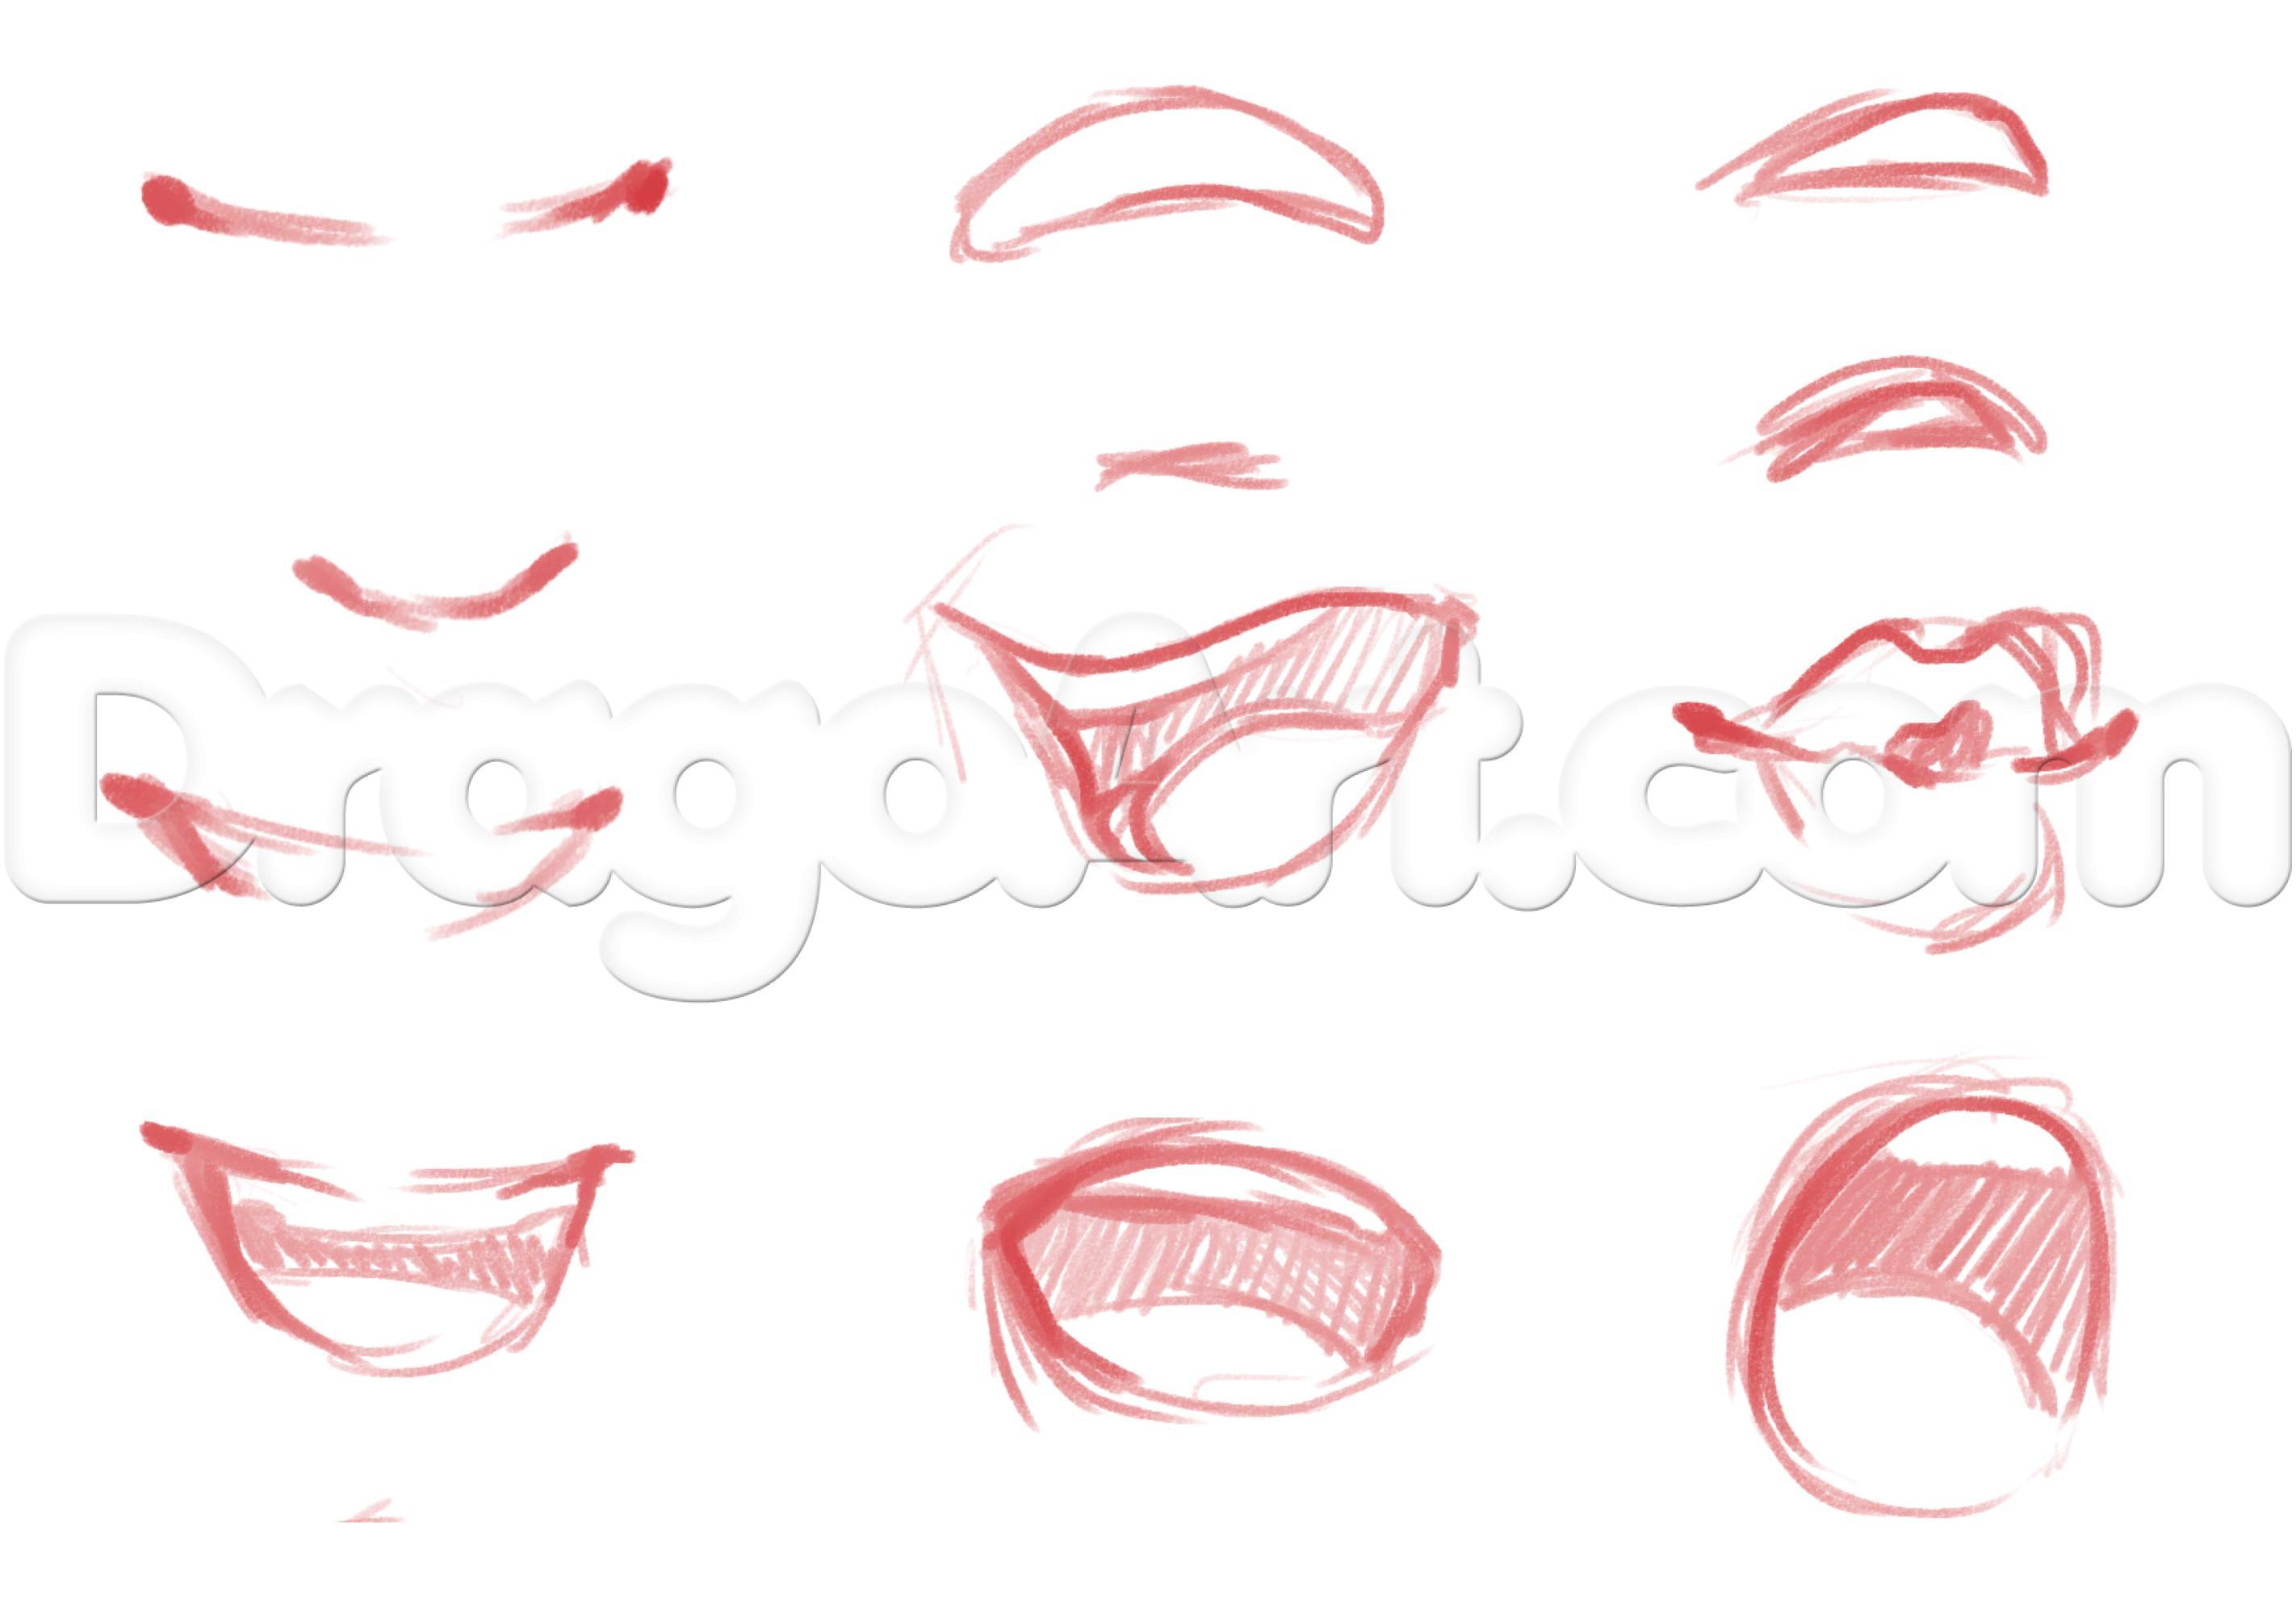 2844x1998 Anime Lips Drawing Drawn Smile Anime